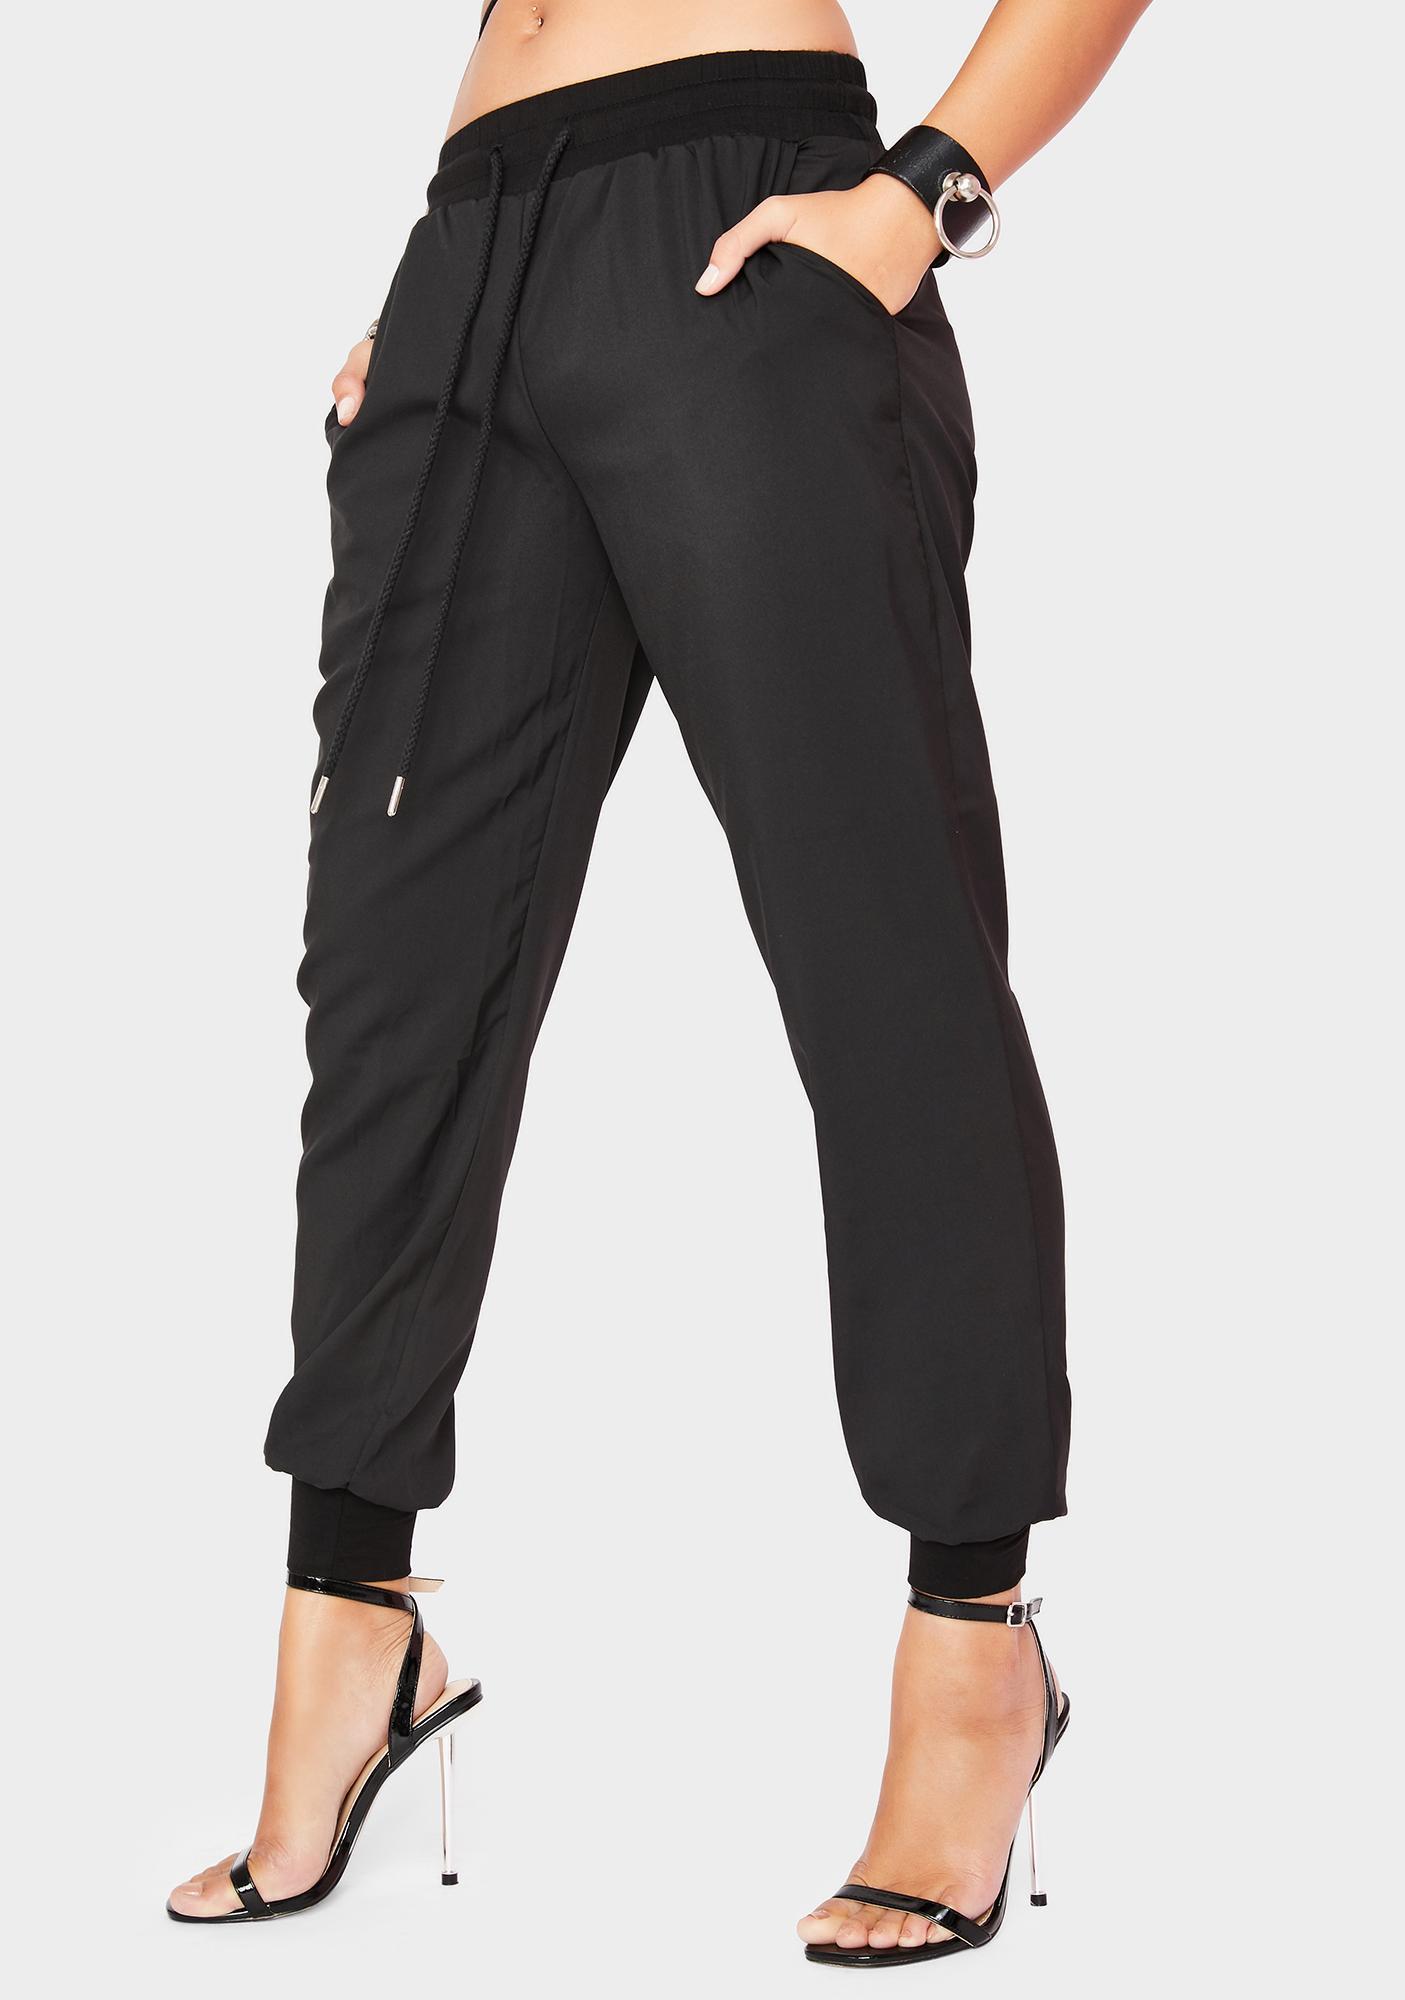 New Boo Jogger Sweatpants